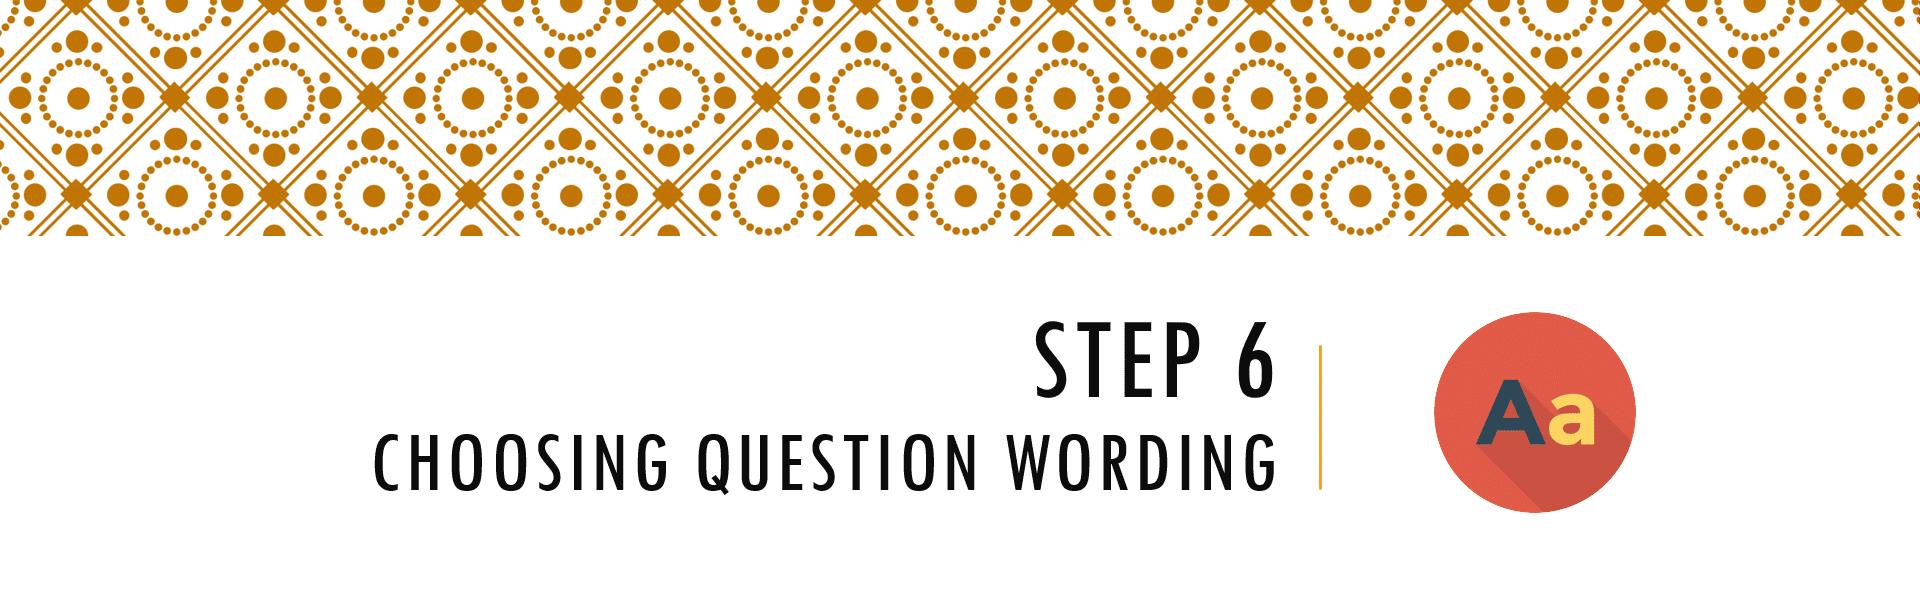 Questionnaire Design Process Step 6 - Choosing Question Wording